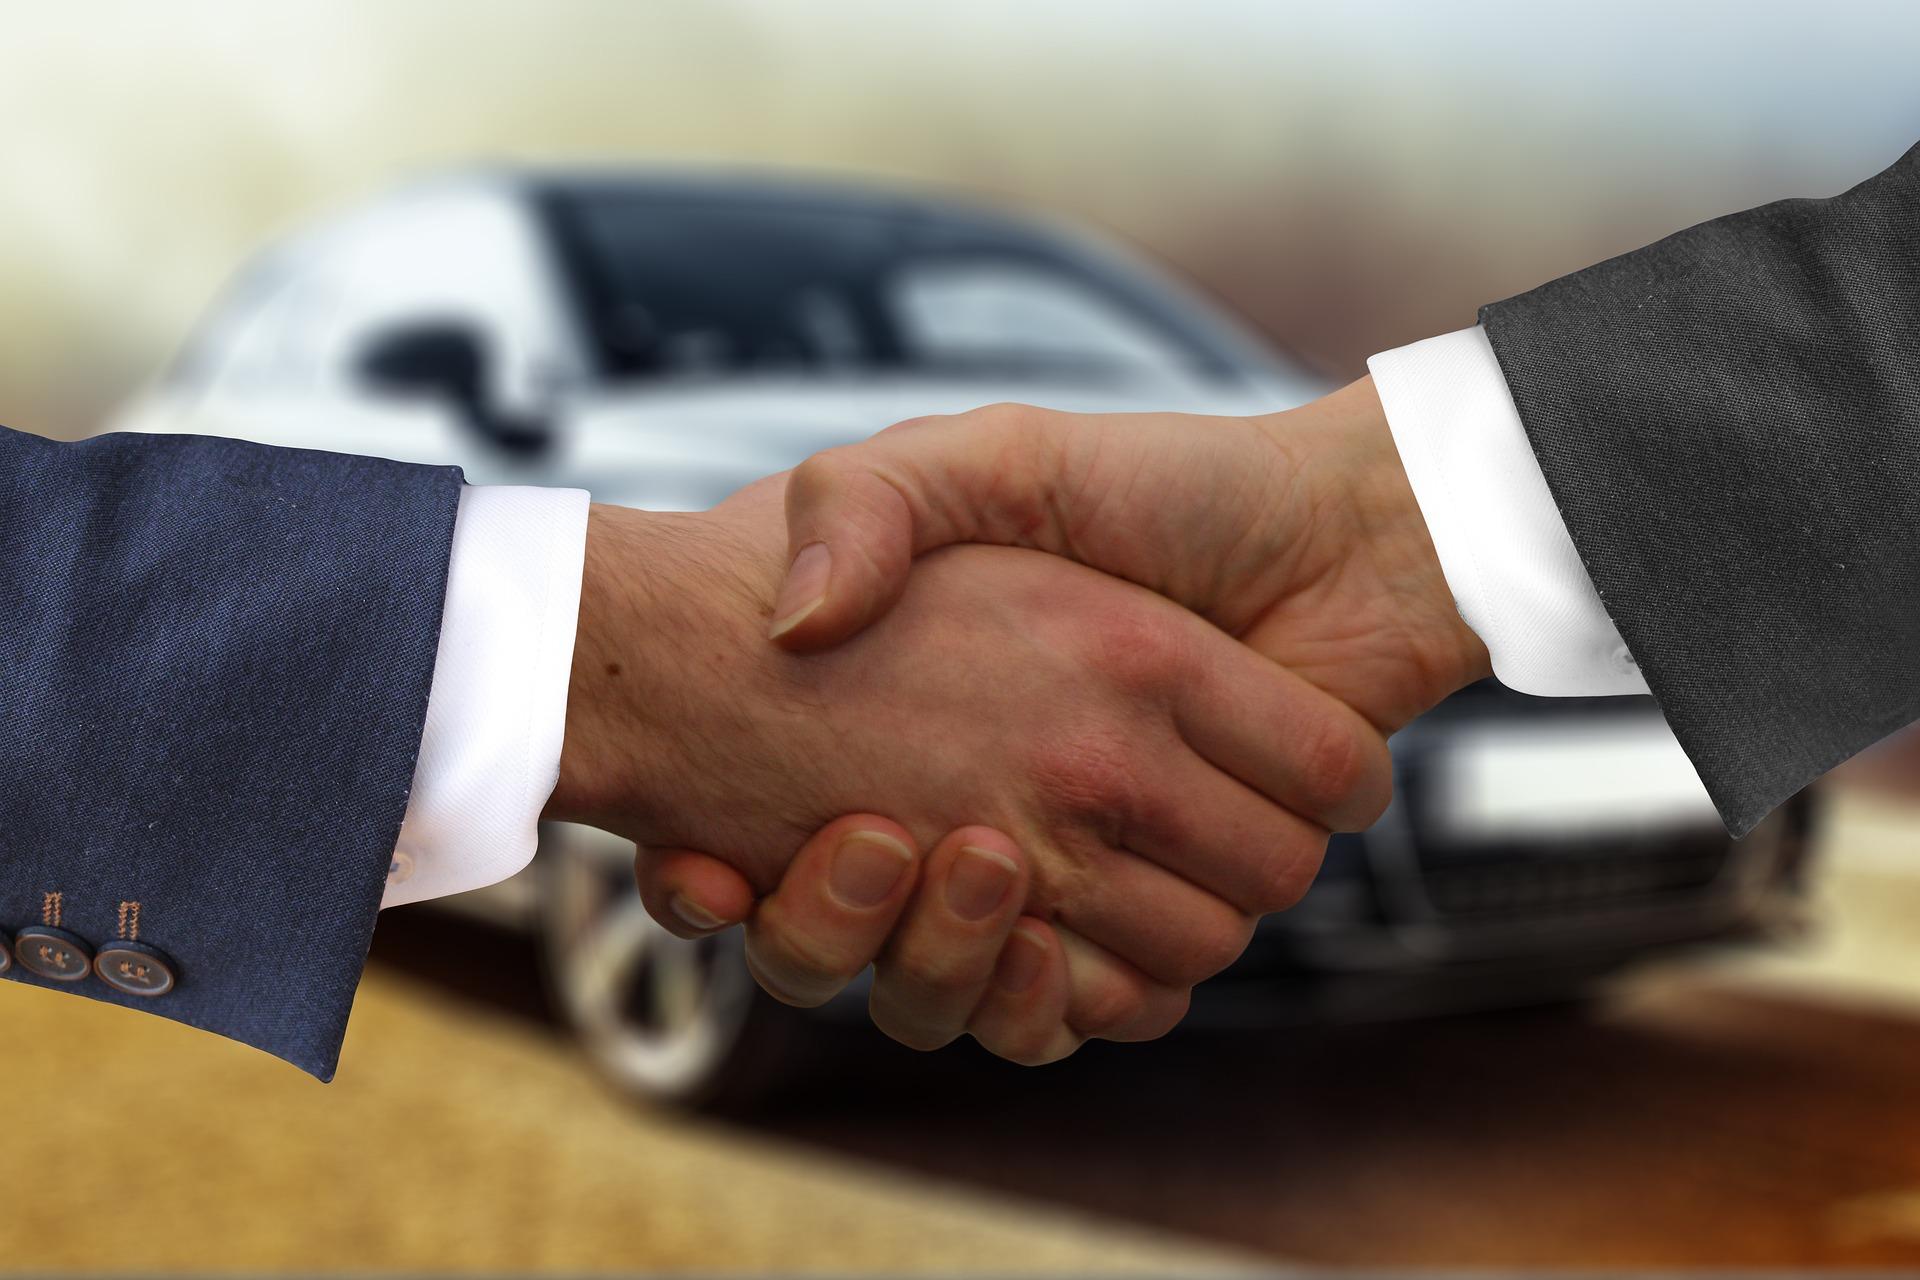 ВРоссии стартует продажа авто онлайн через AliExpress